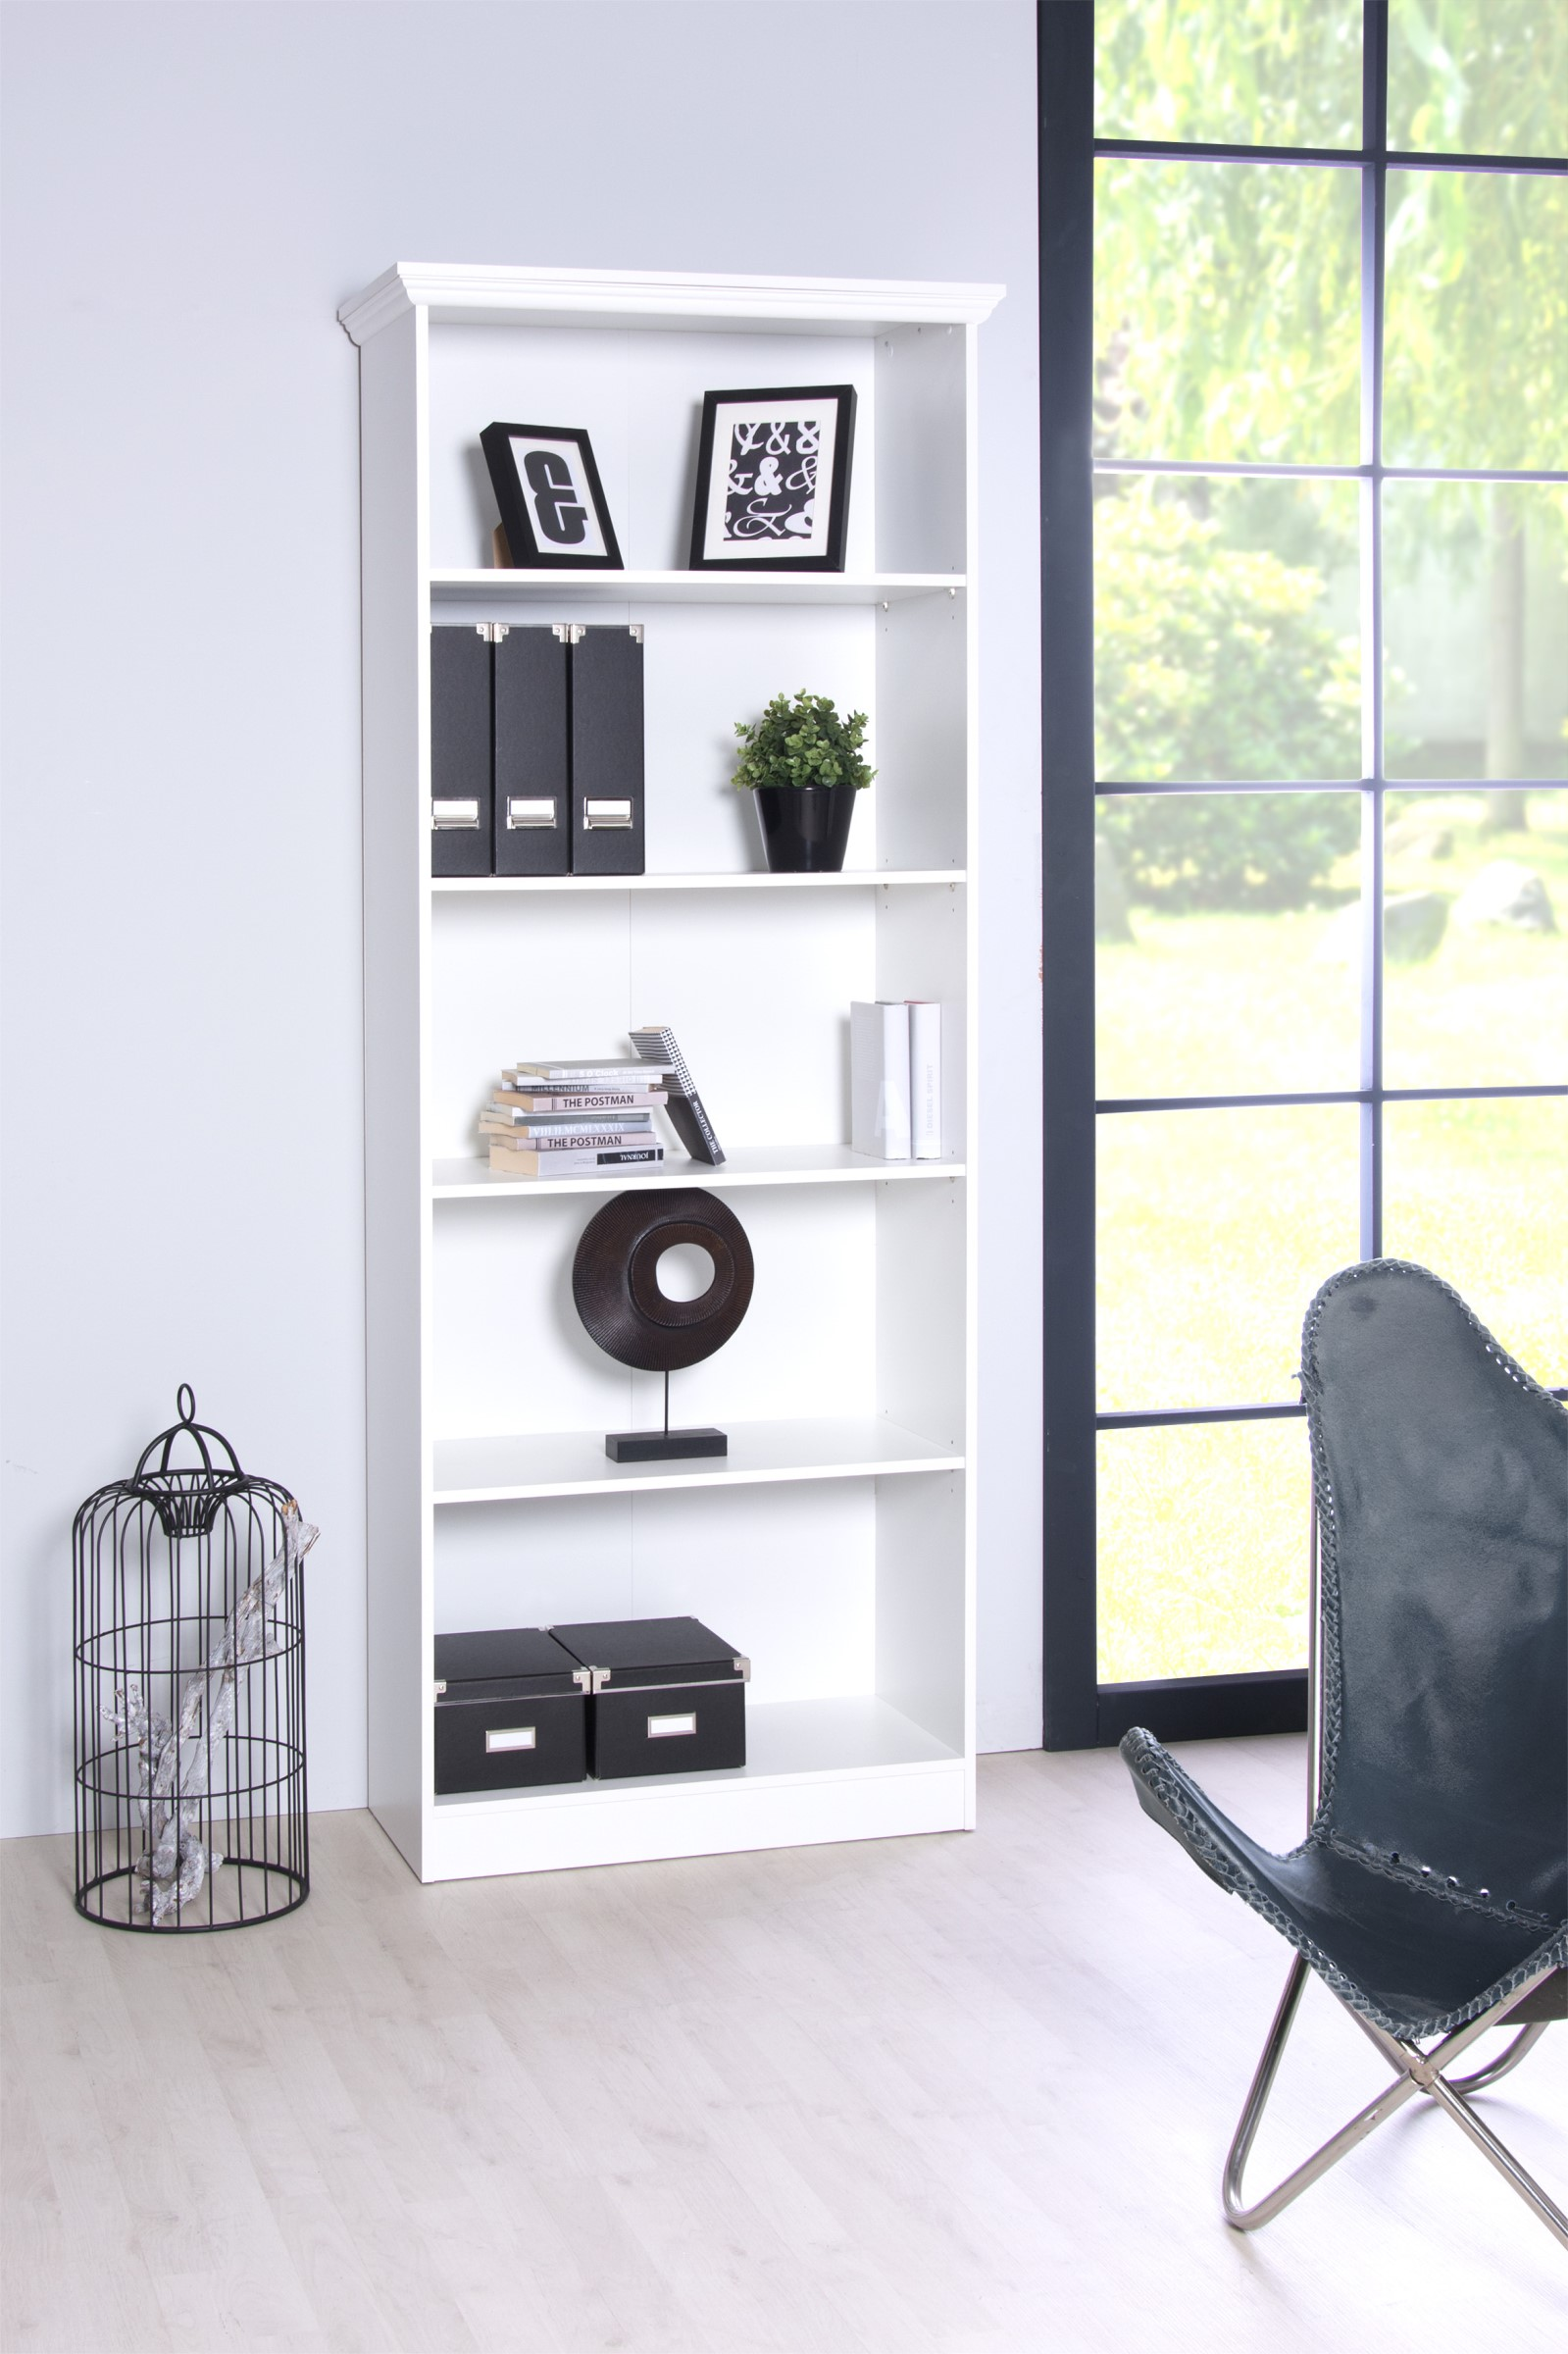 regale g nstig online kaufen bei fun m bel fun m bel. Black Bedroom Furniture Sets. Home Design Ideas